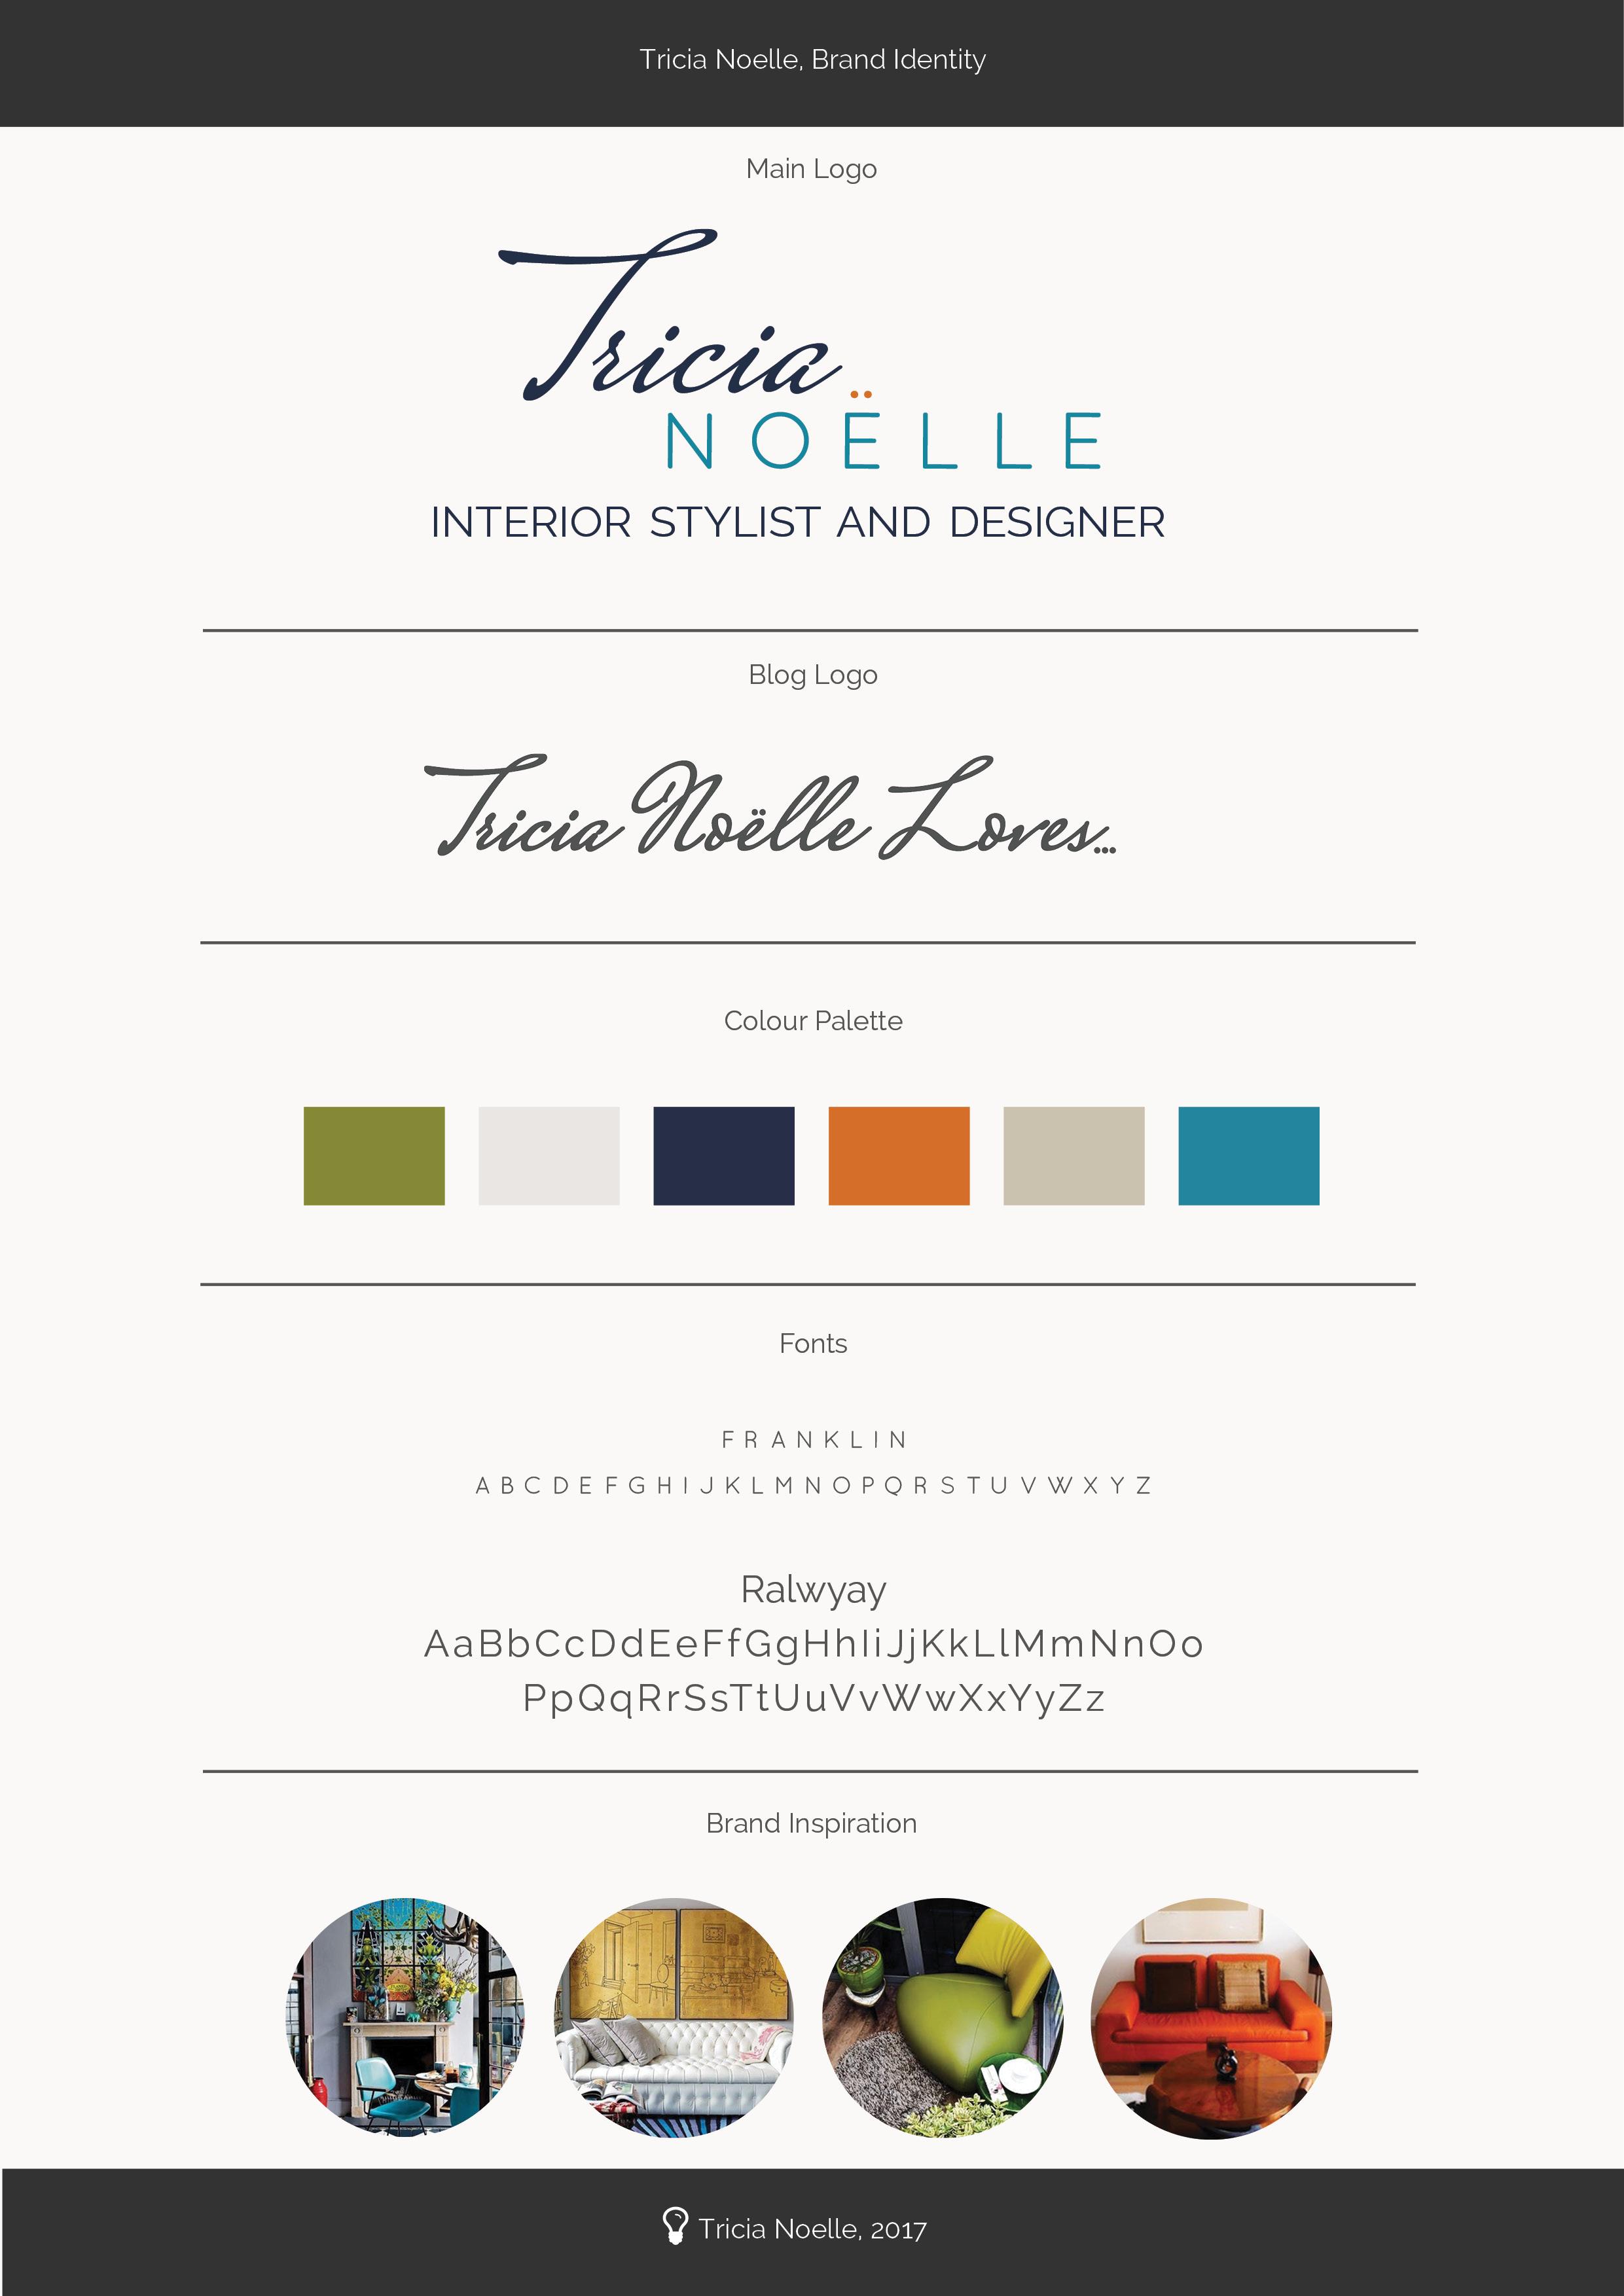 Tricia Noelle Brand Identity